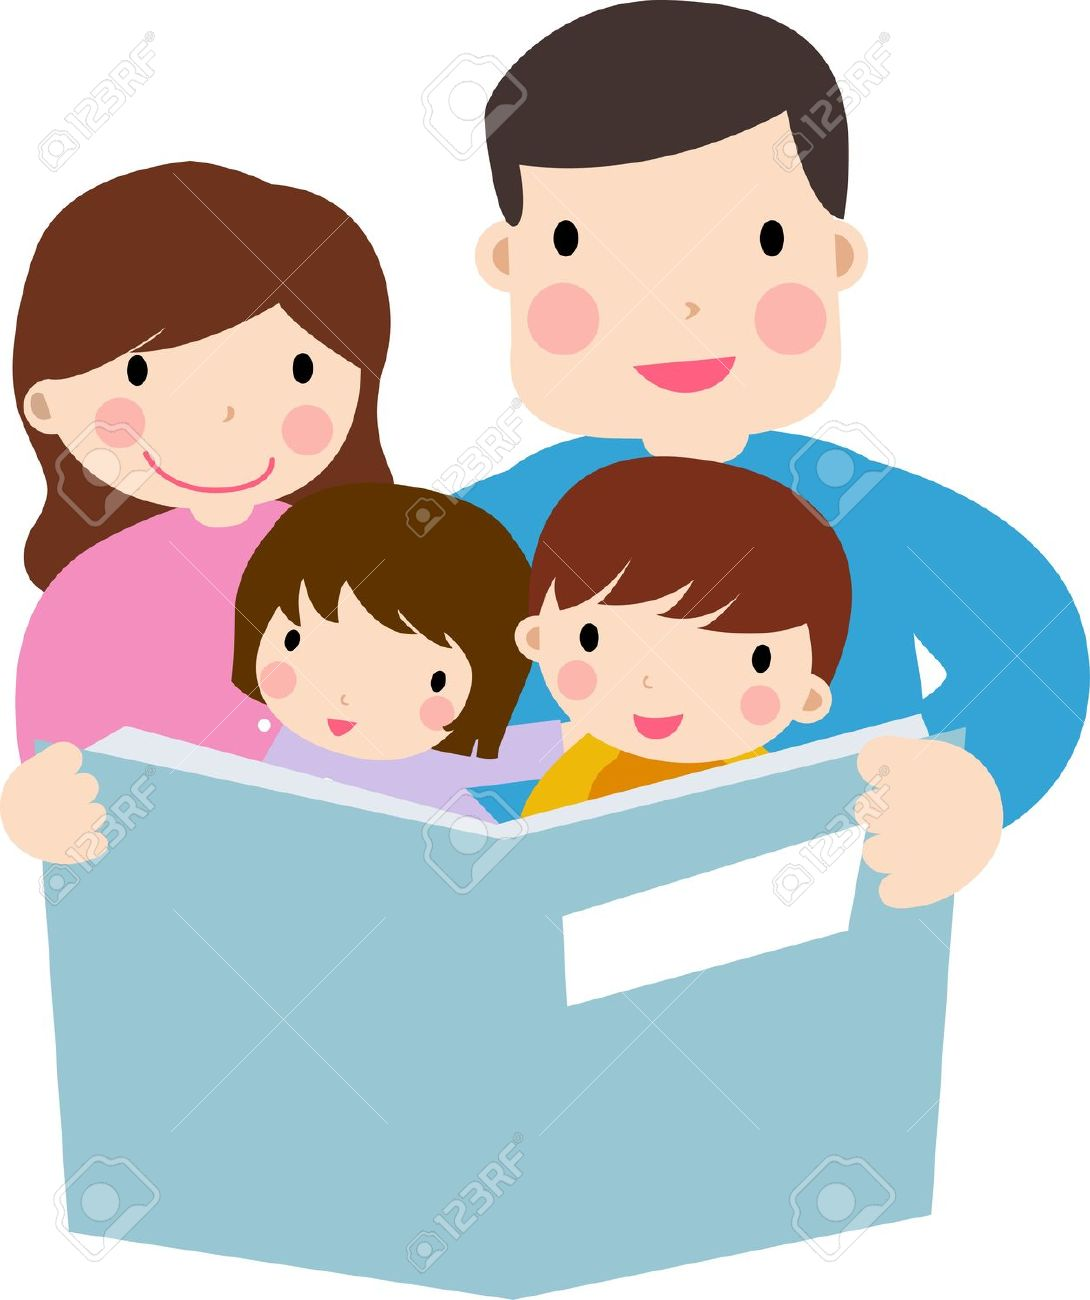 Clip art of child with parent.